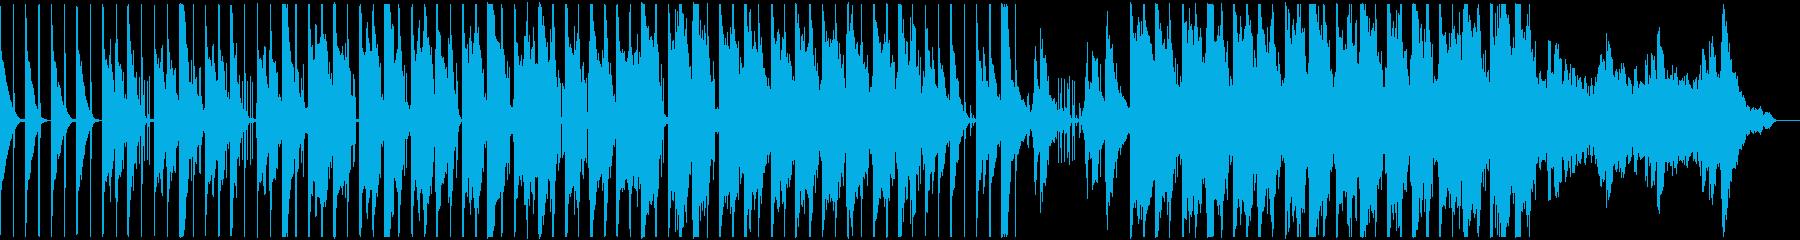 Drifted Awayの再生済みの波形